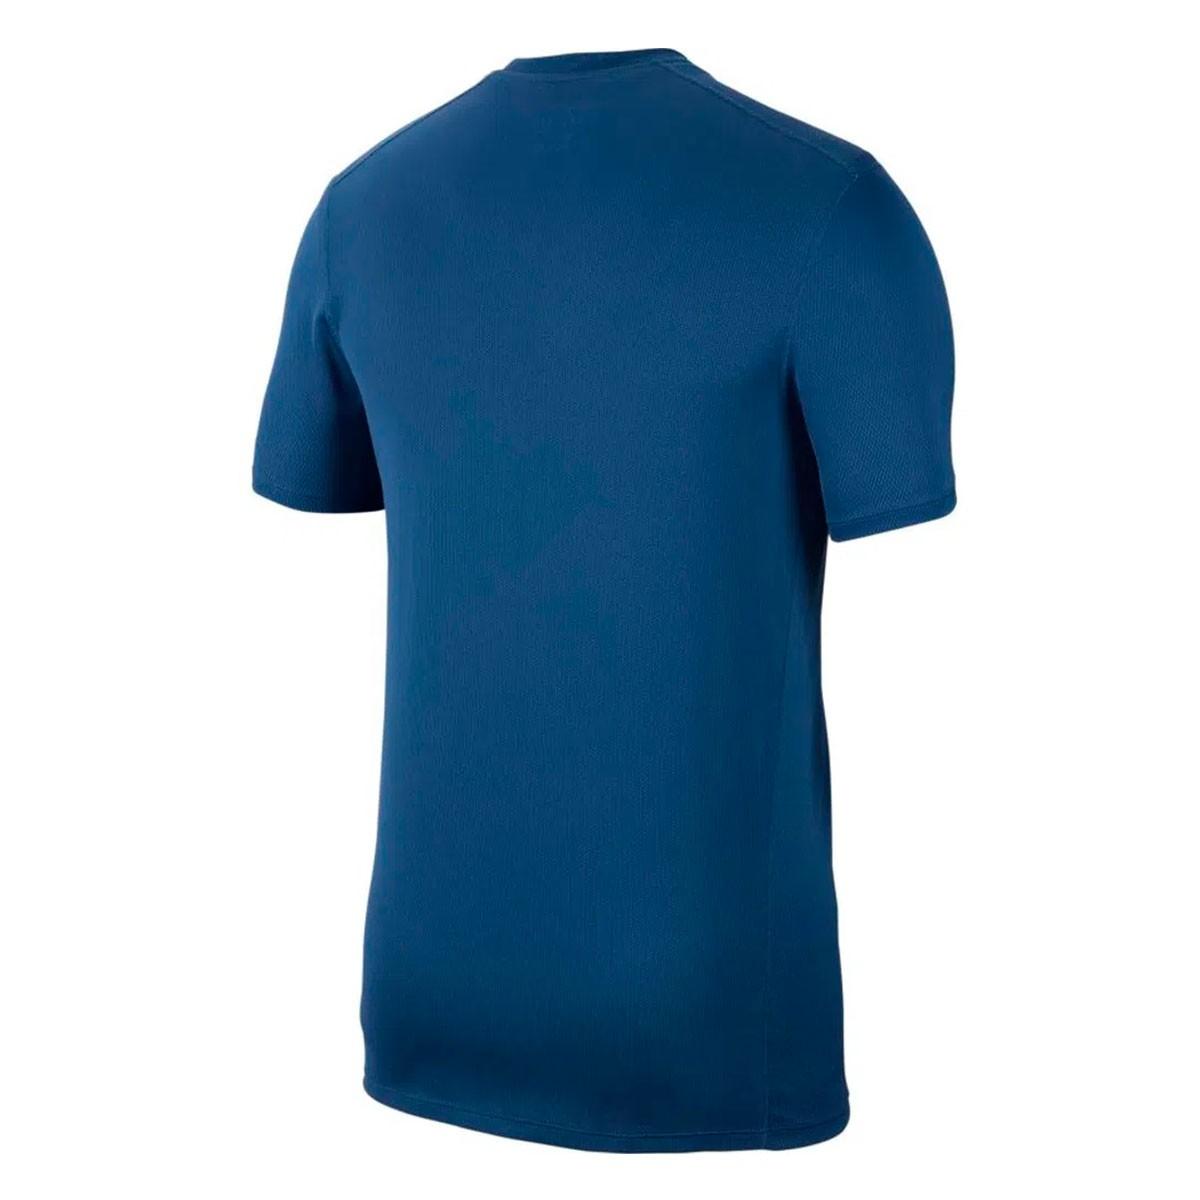 Camiseta Nike Run SS Fiesta Azul